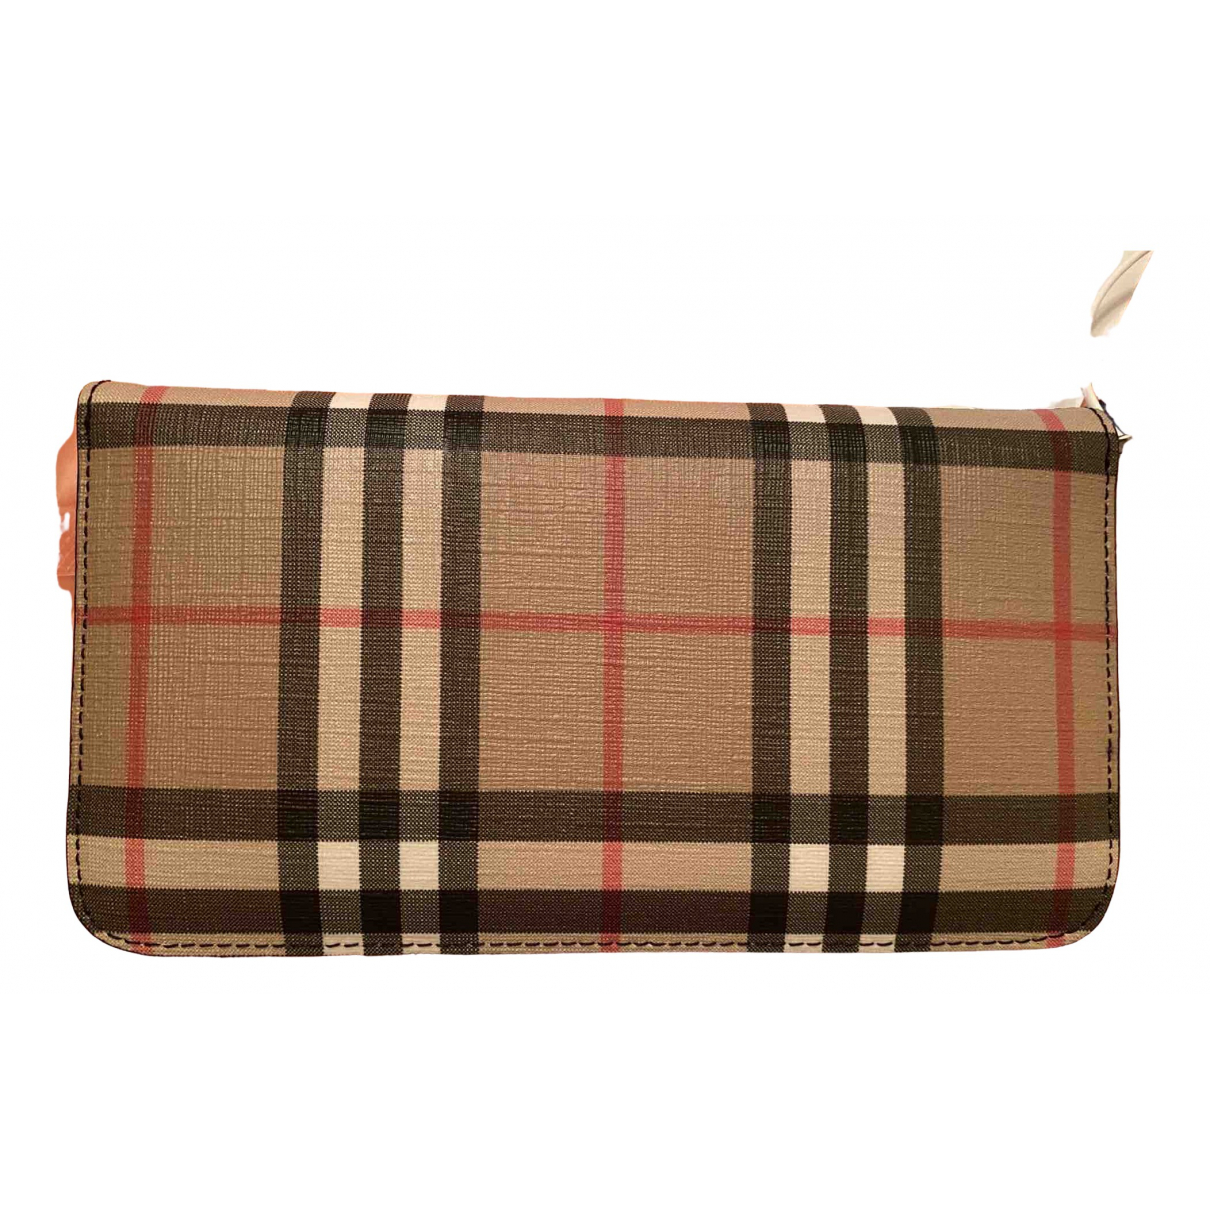 Burberry \N Beige Leather wallet for Women \N